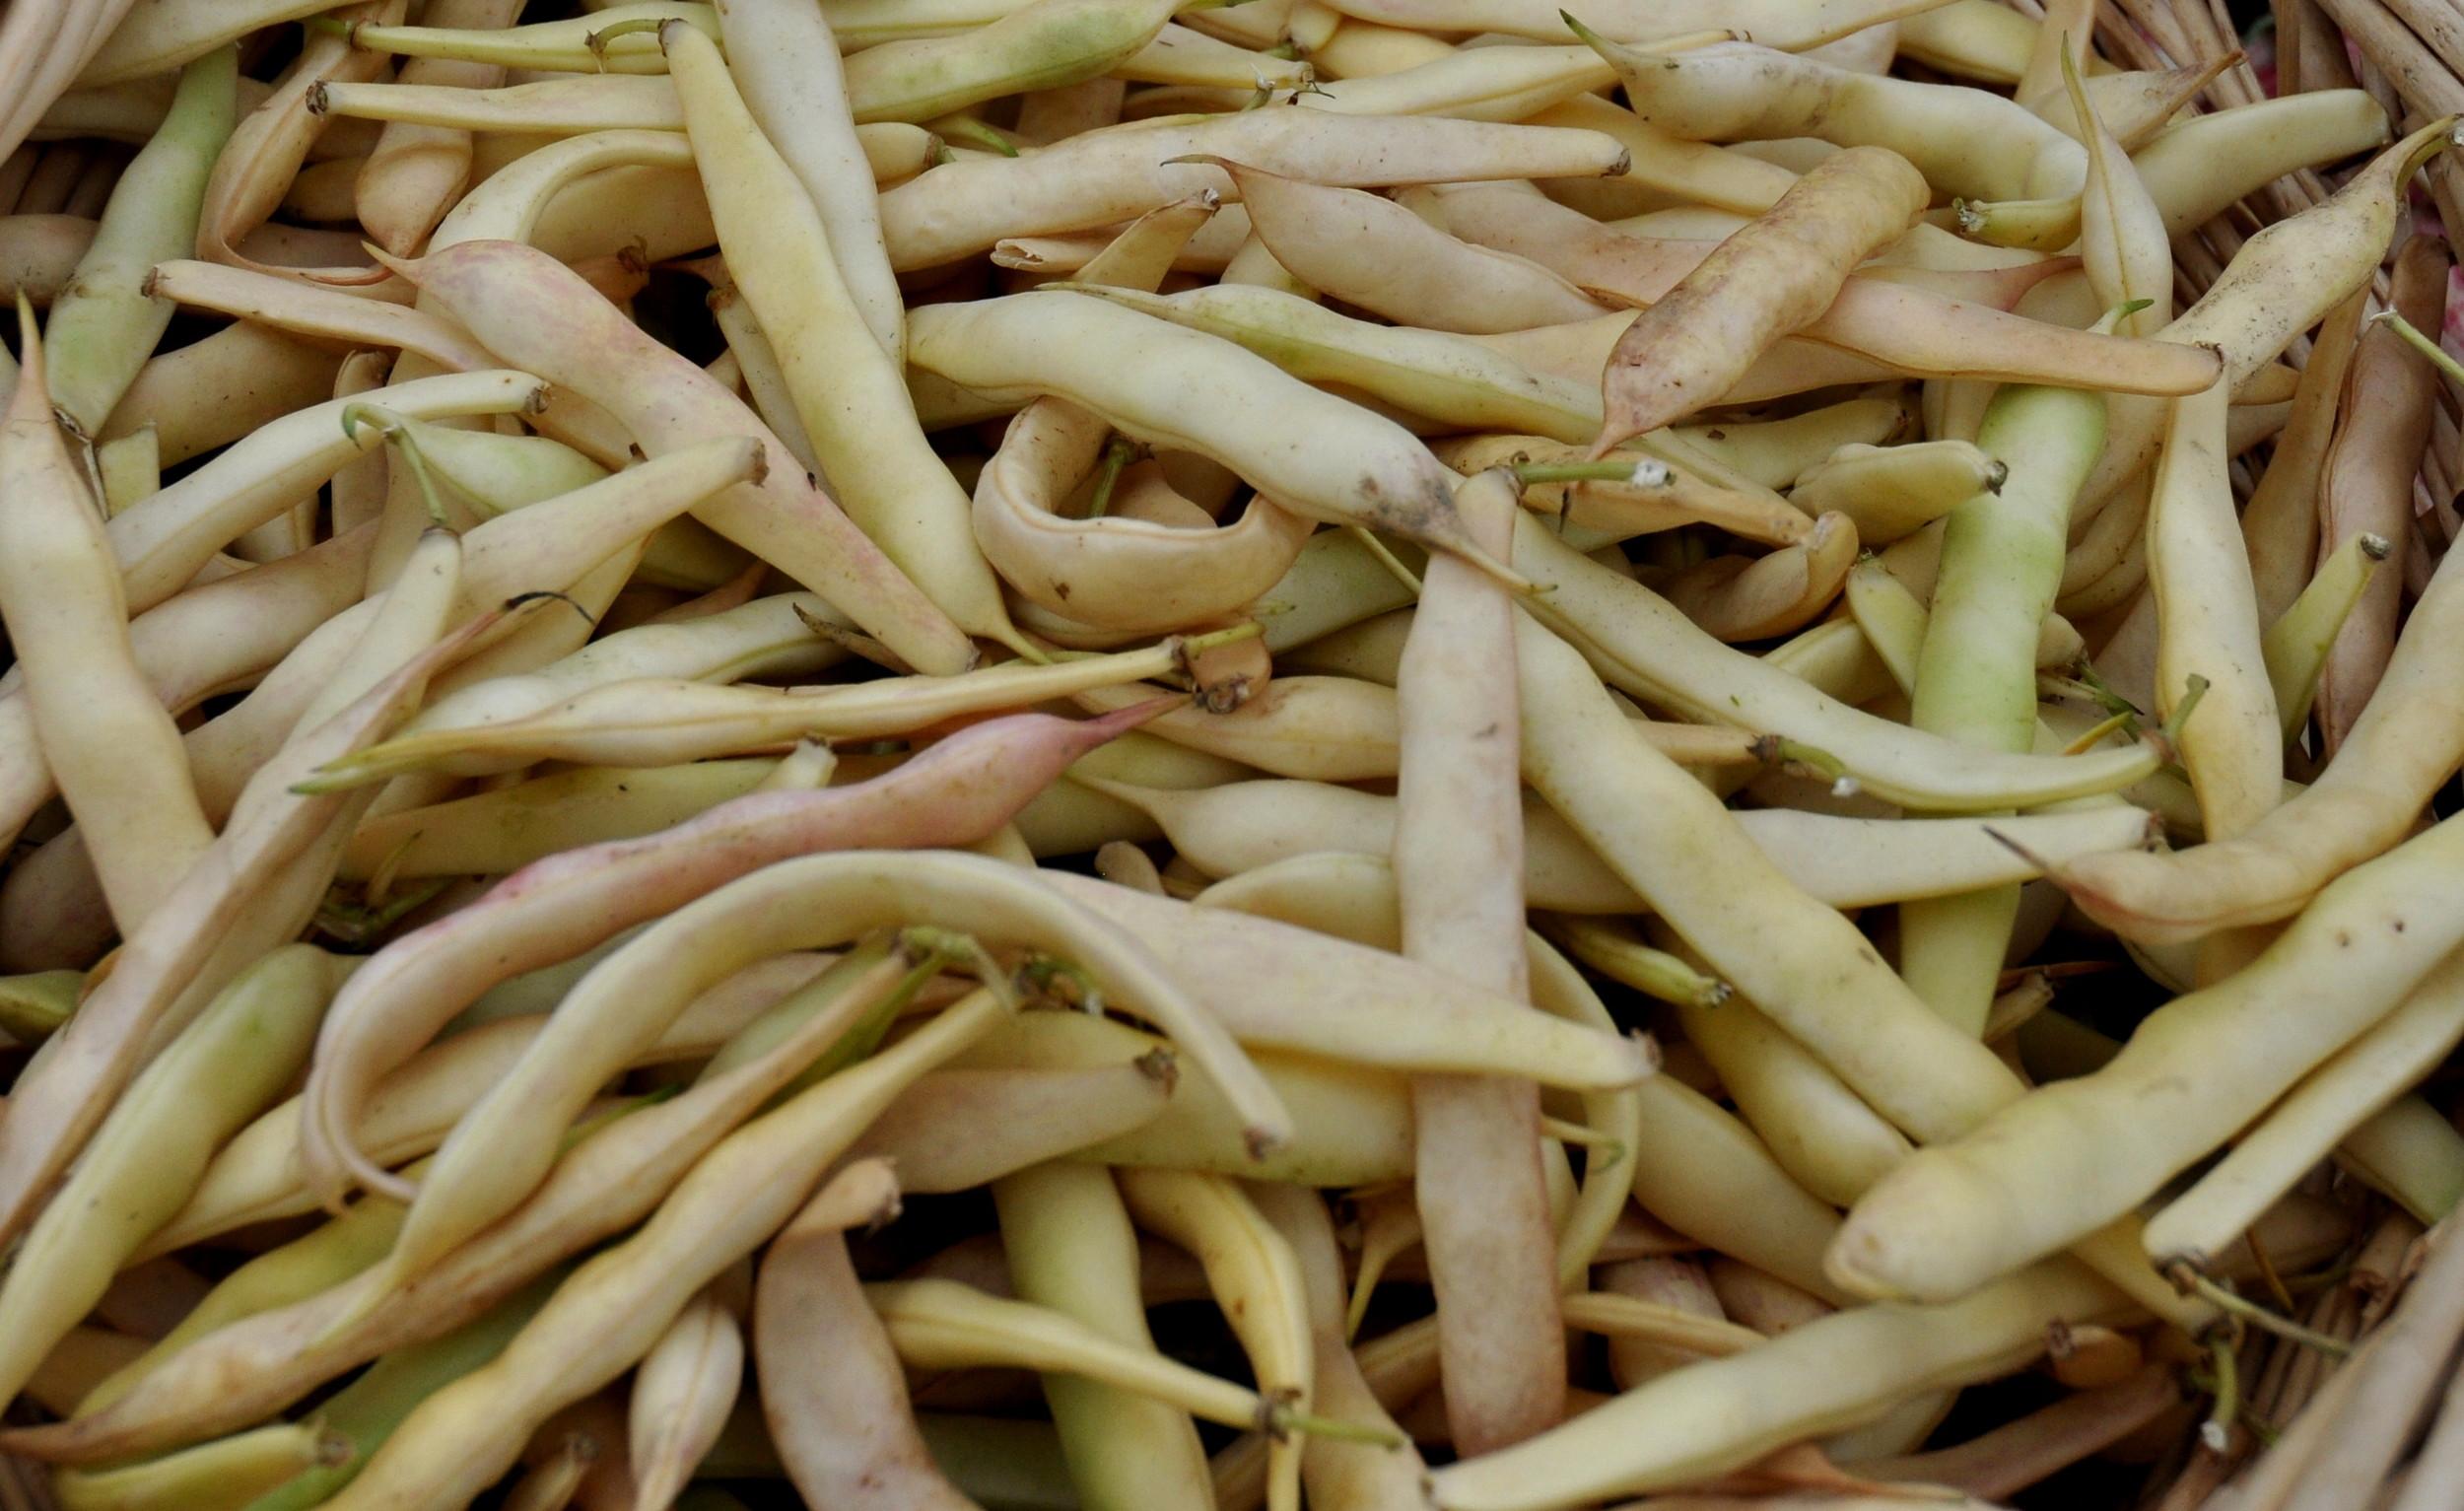 Fresh cannellini shelling beans from One Leaf Farmat Wallingford Farmers Market. Copyright Zachary D. Lyons.